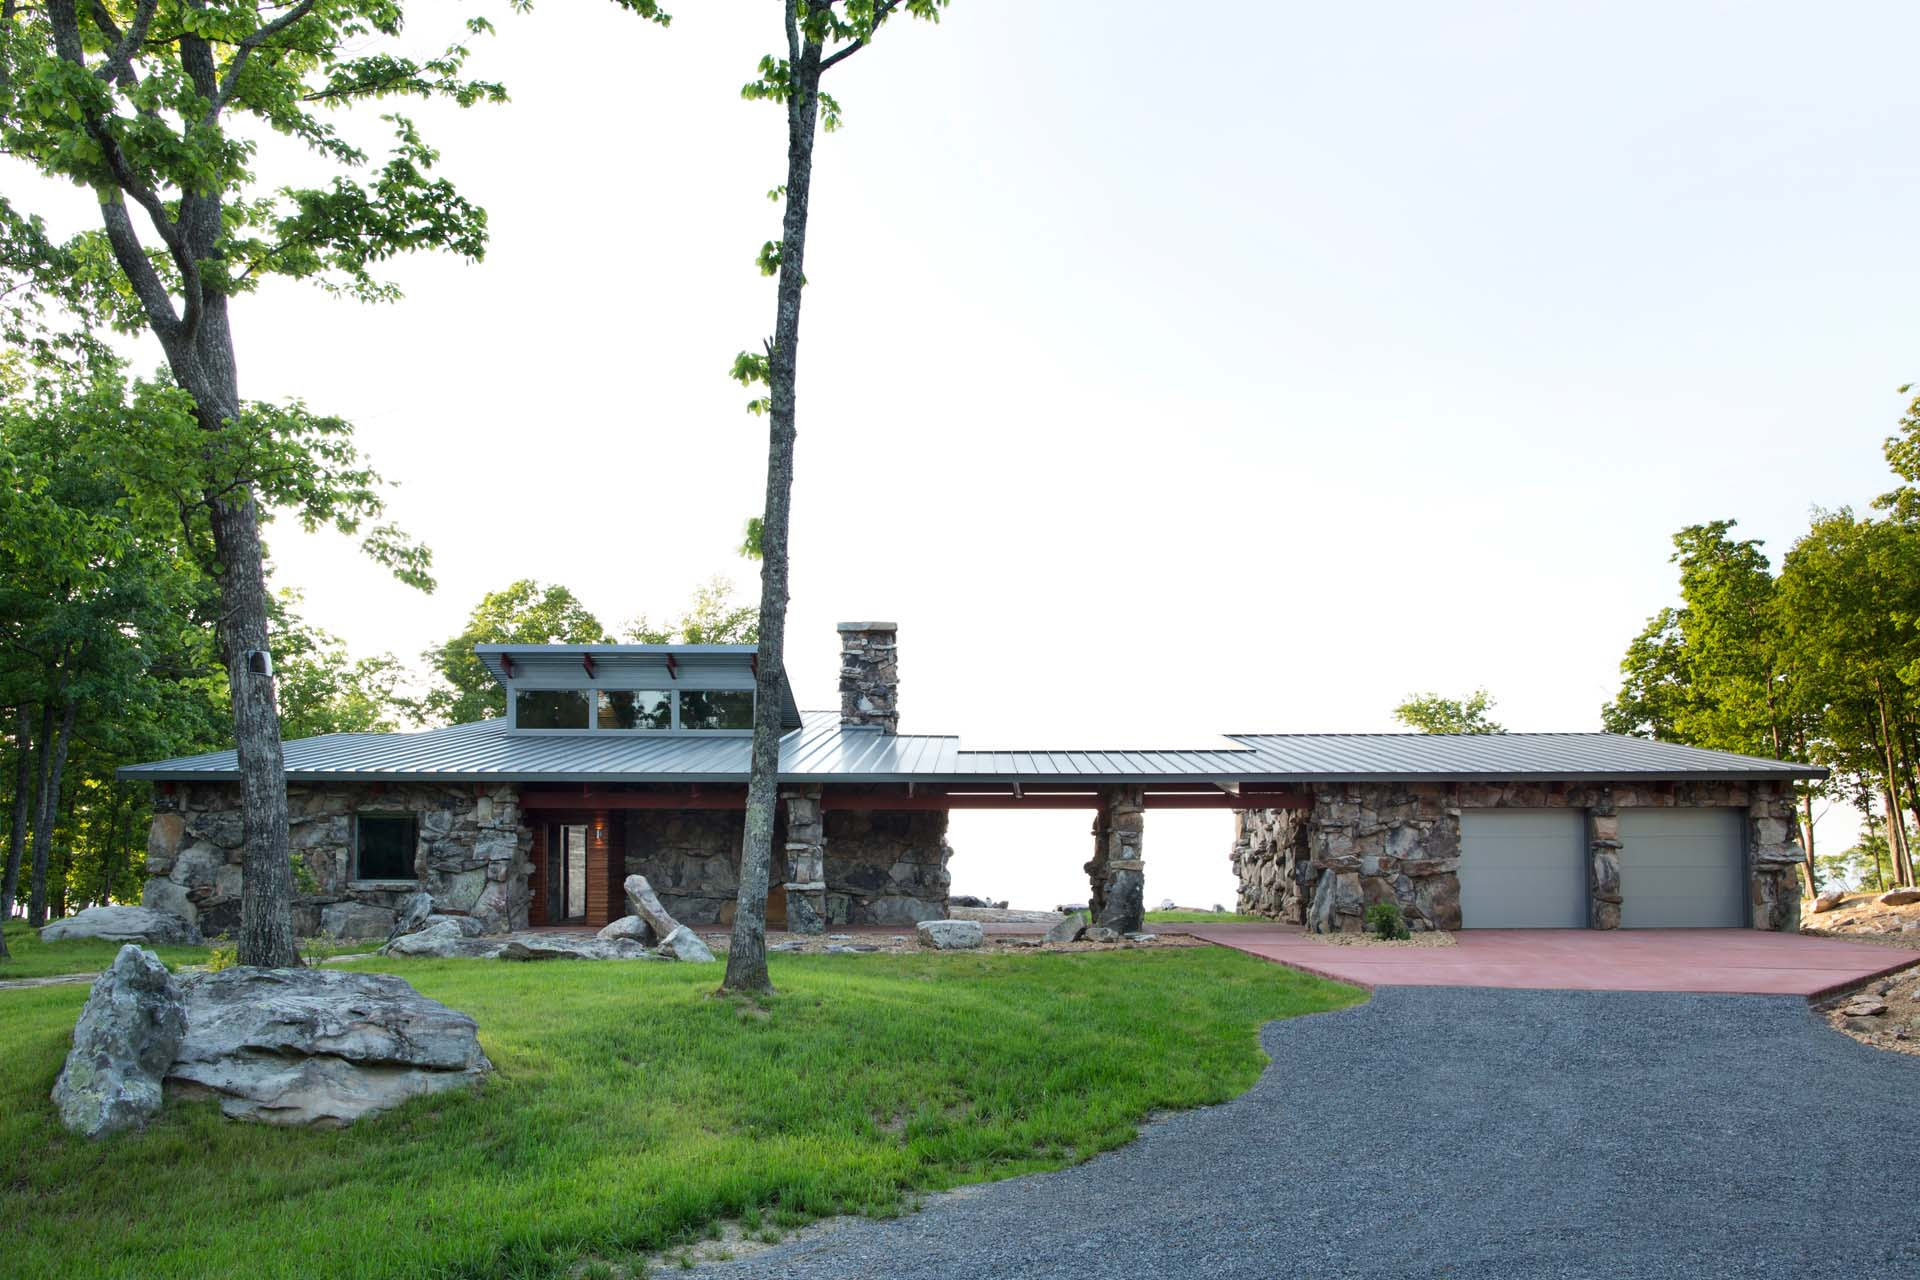 Interview with architect Heidi Hefferlin - uncube